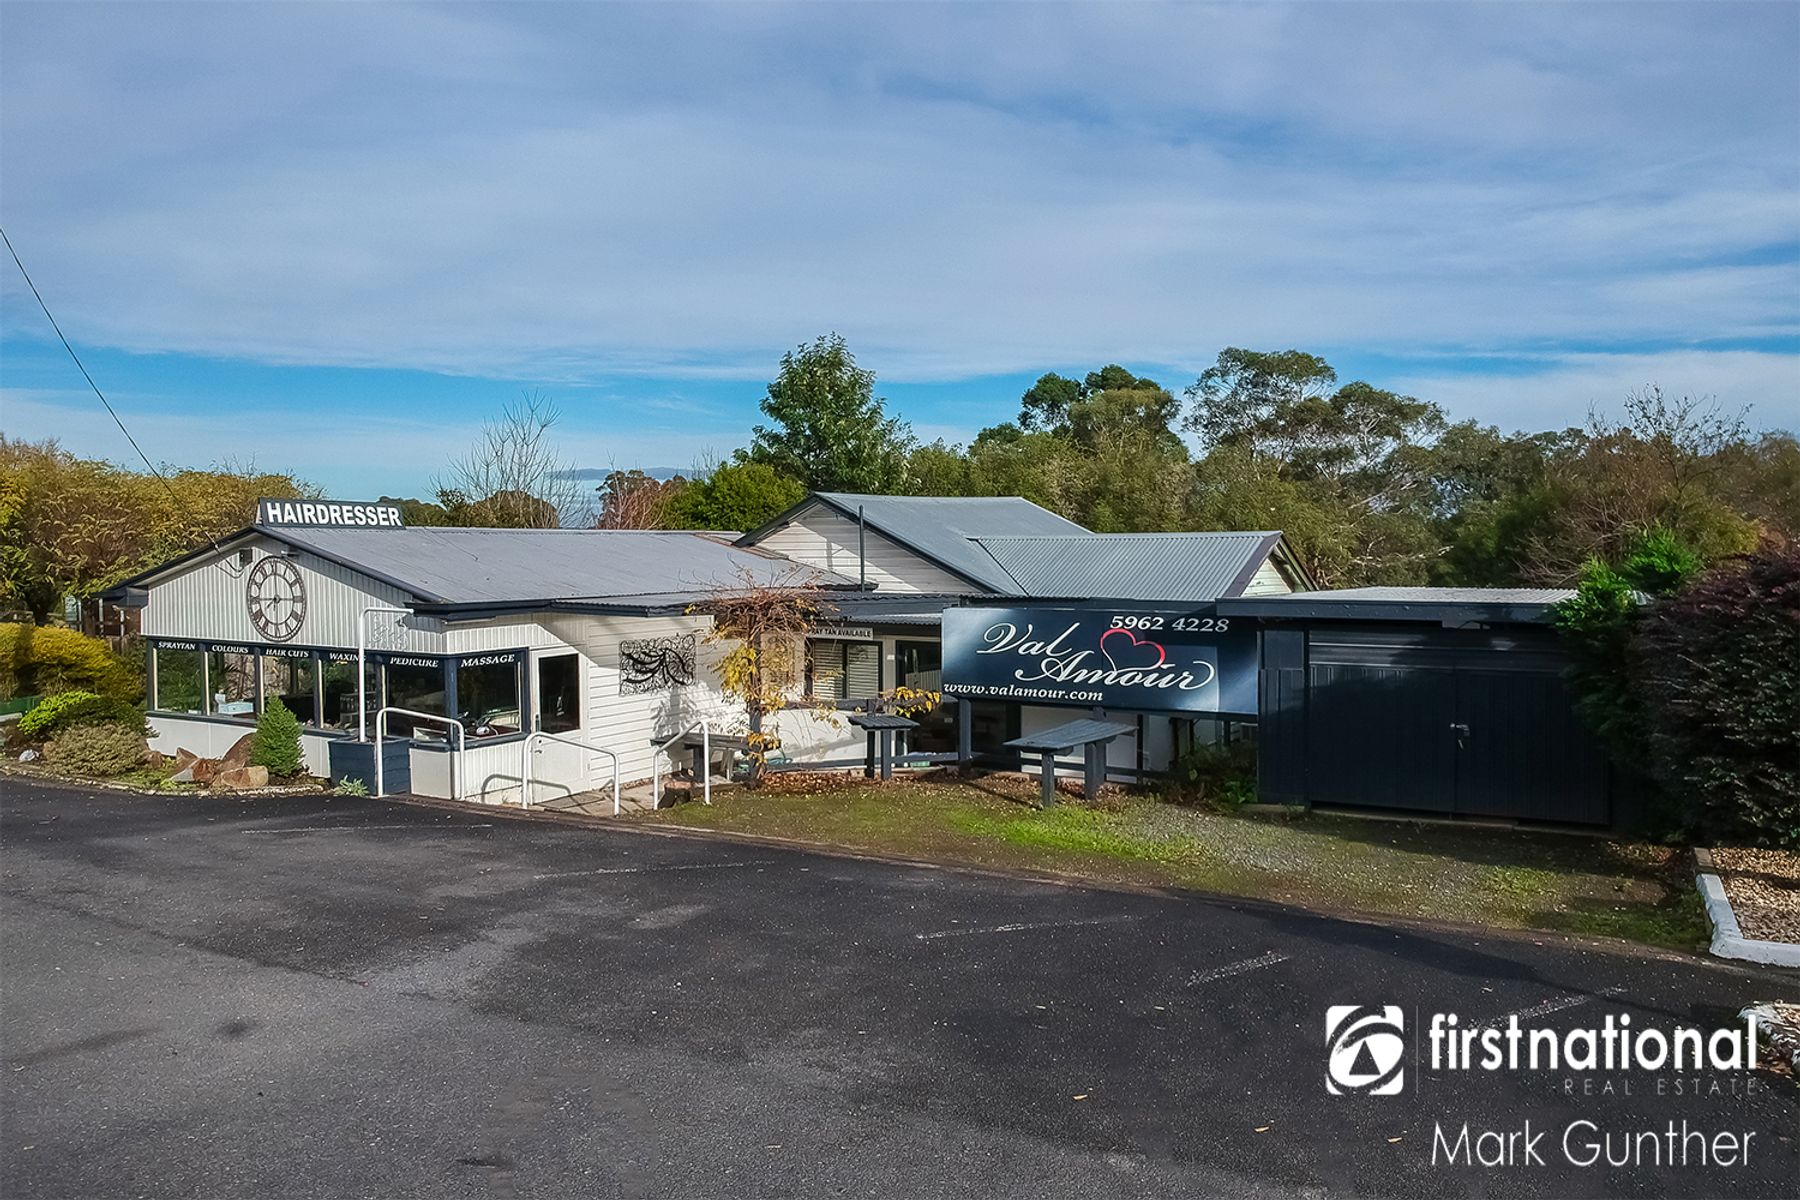 43 Maroondah Highway, Healesville, VIC 3777